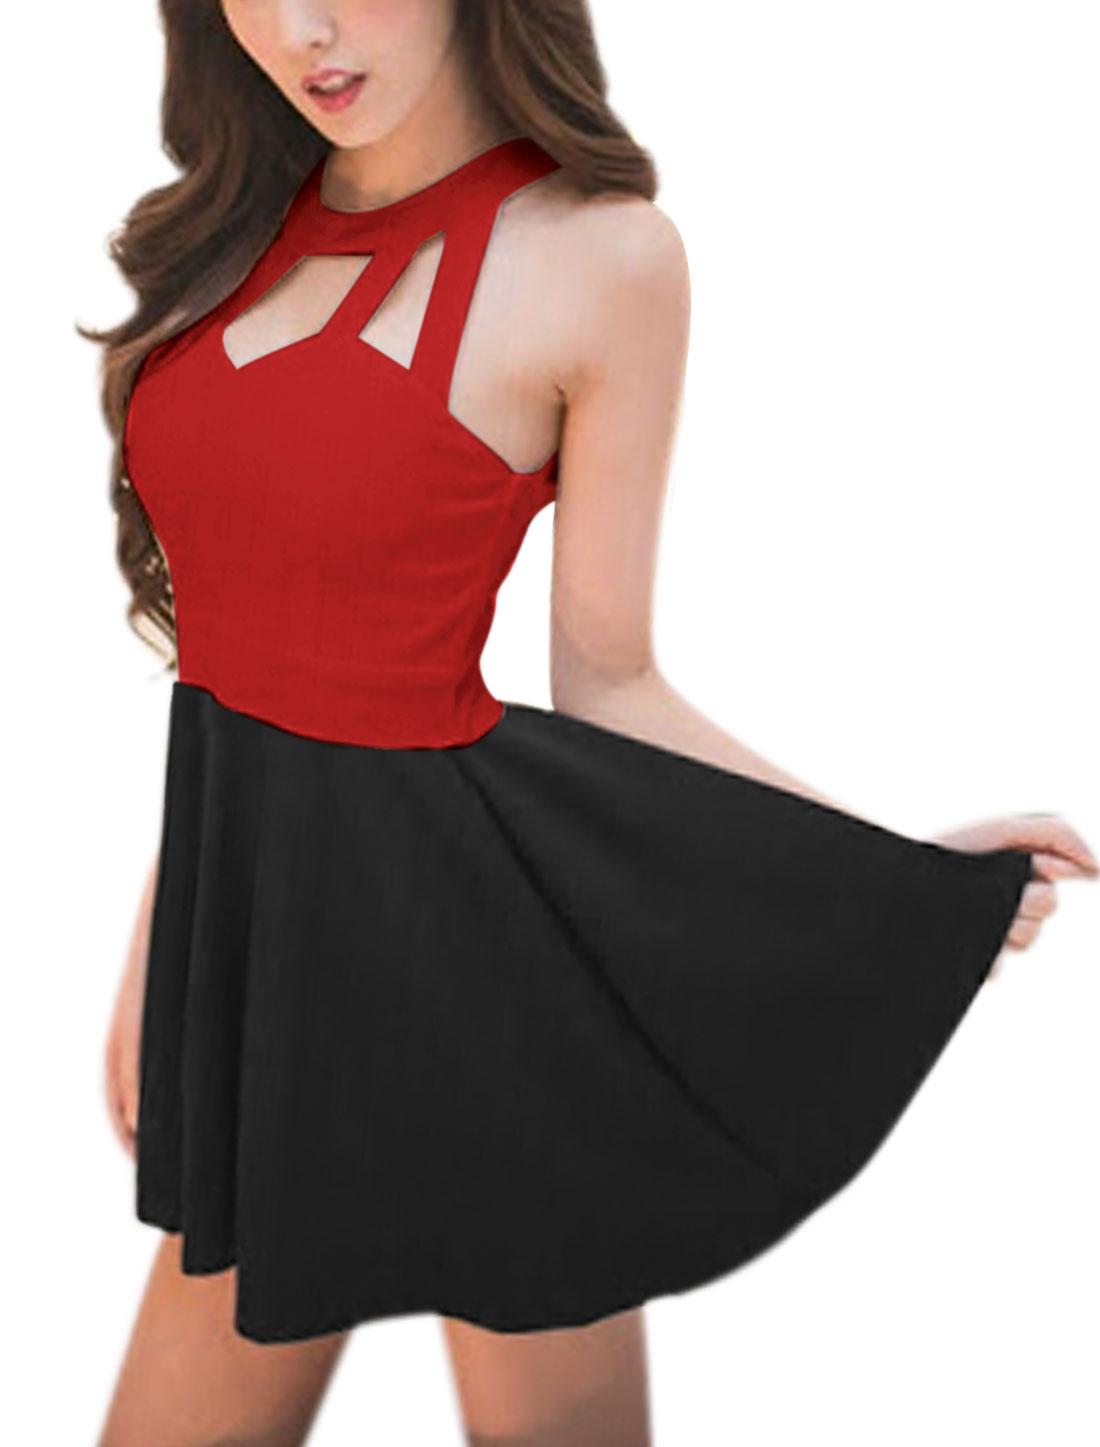 Ladies Color Blocked Sleeveless Unlined Mini Dress Red Black XS